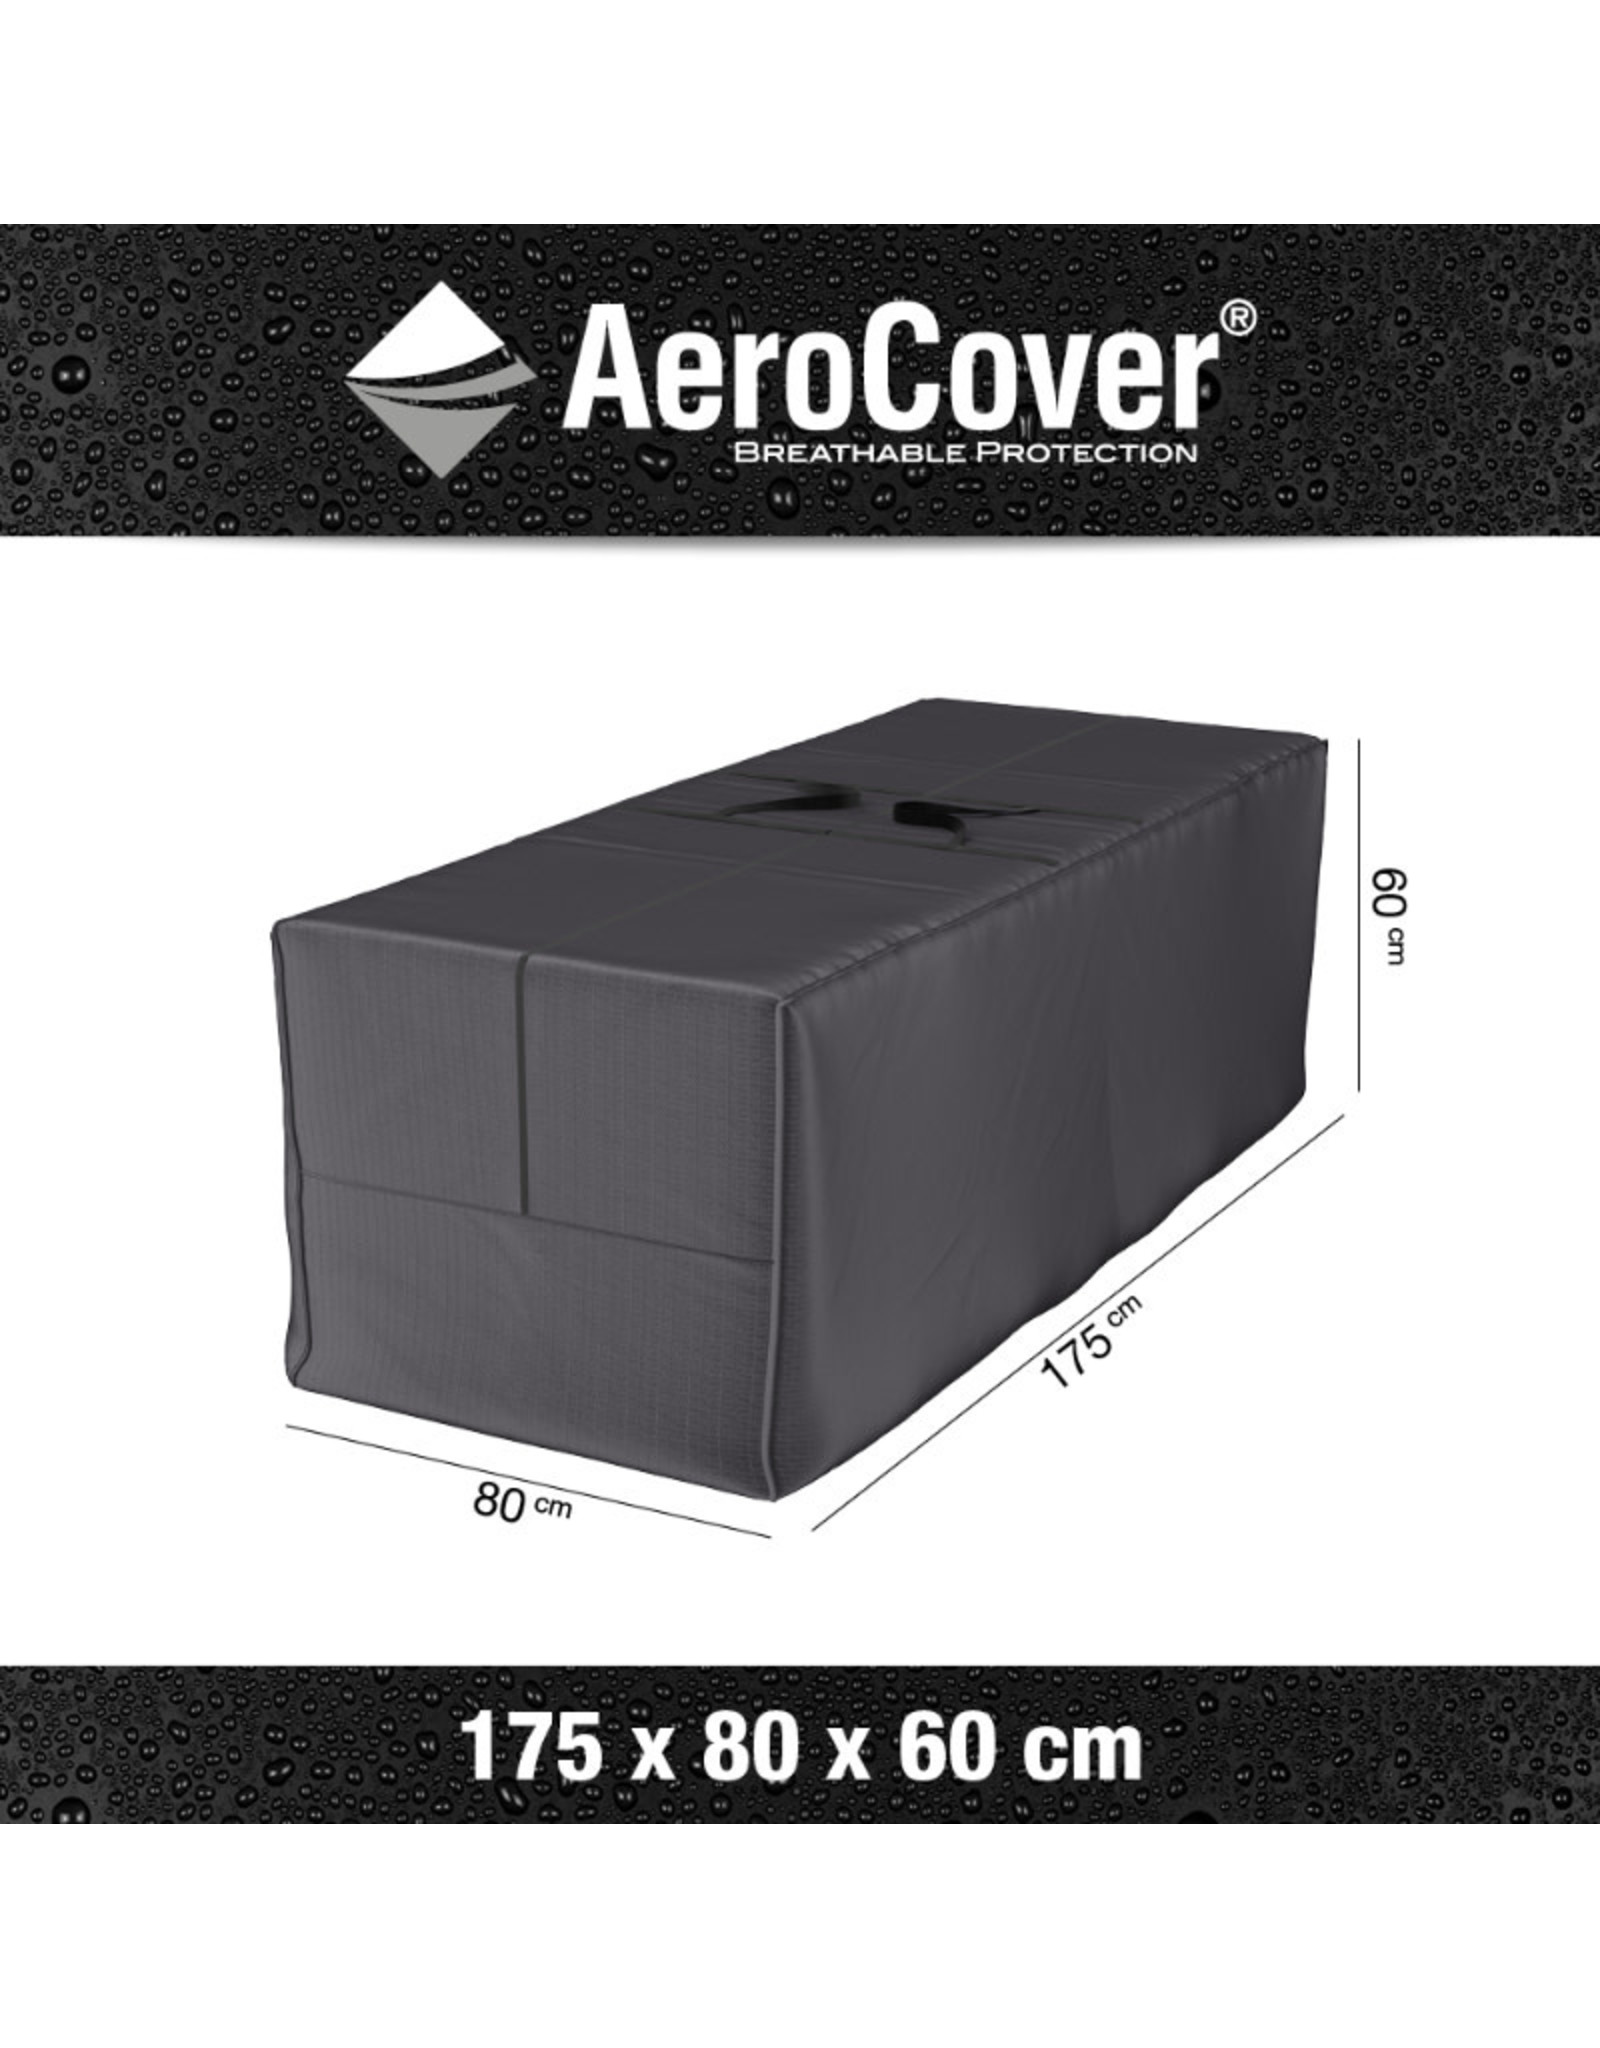 Aerocover AeroCover Cushion bag 175x80xH60